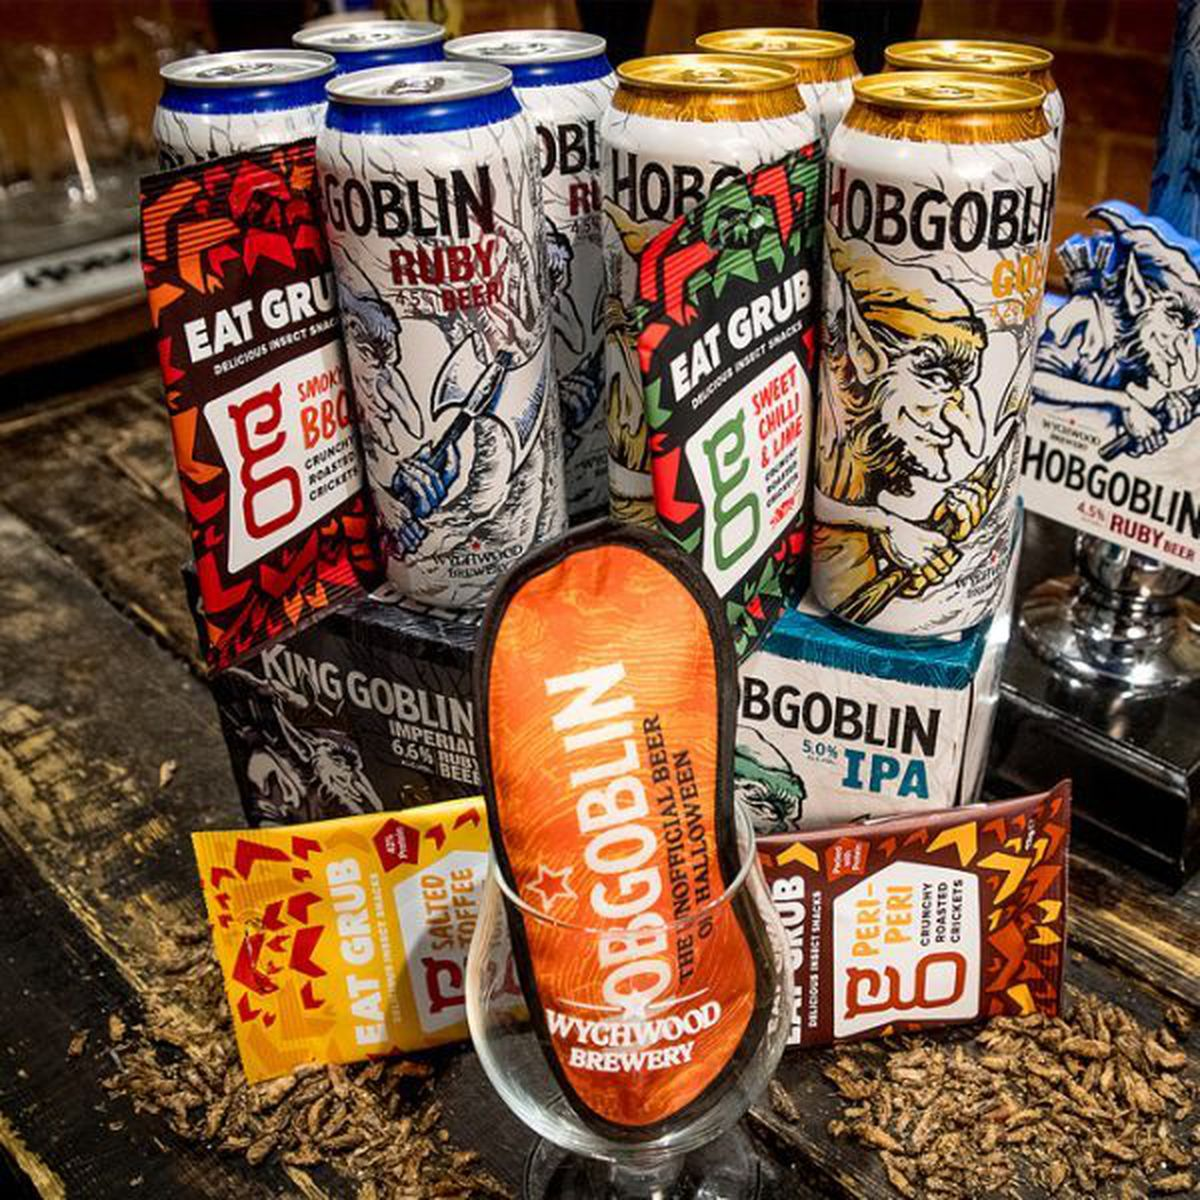 Hobgoblin Beer & Bugs Snack Pack